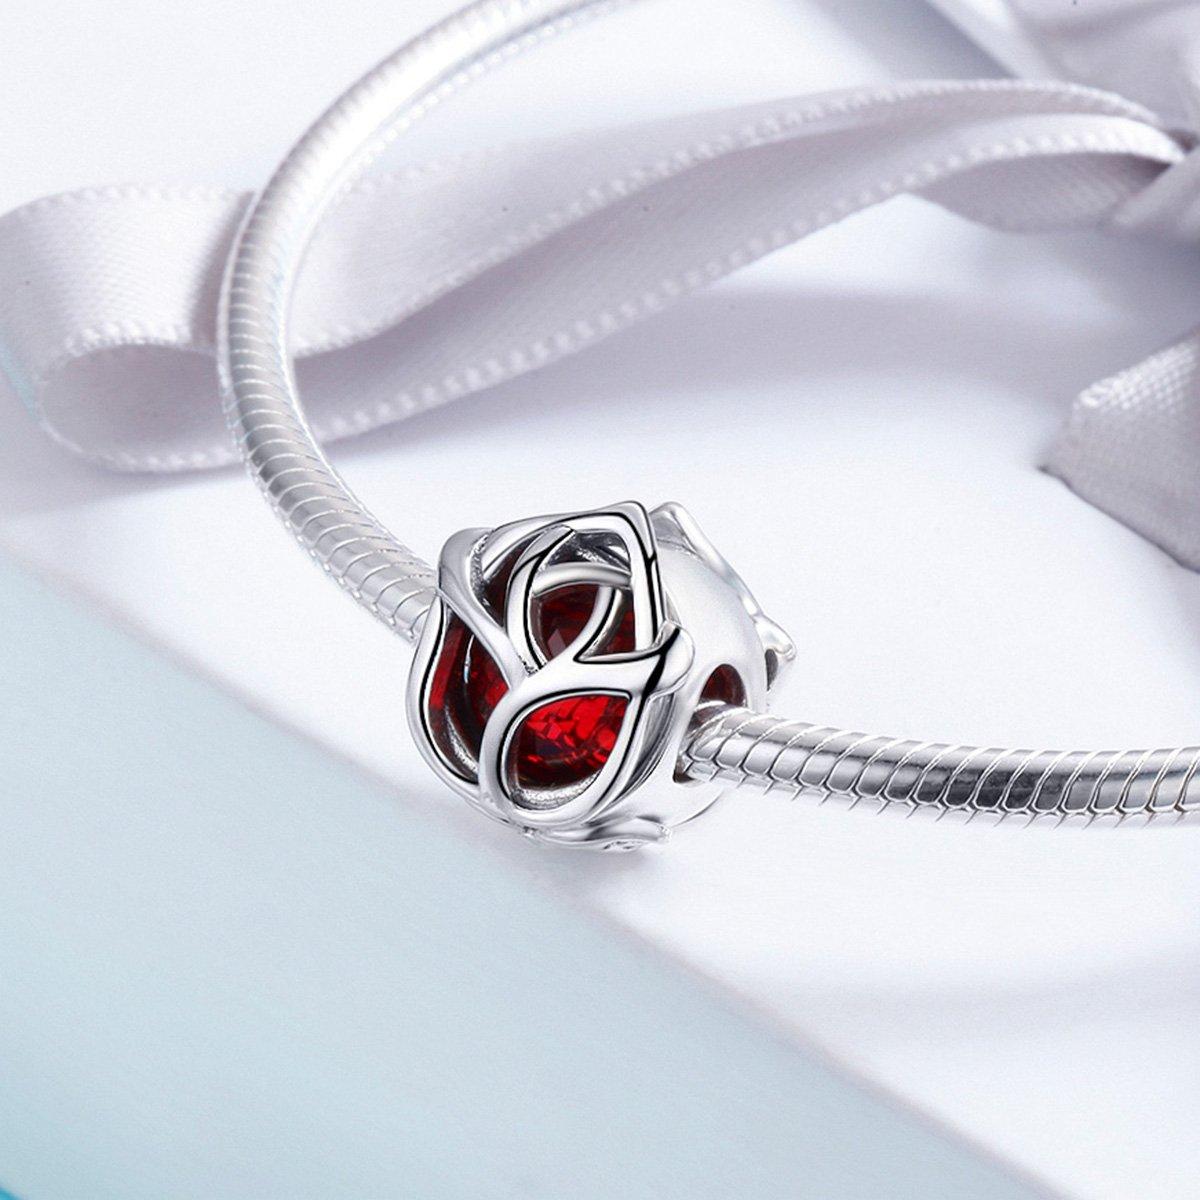 BAMOER 925 Sterling Silver Feathers Angel Wing Heart Shape Charm Bead Fit Bracelet Necklace